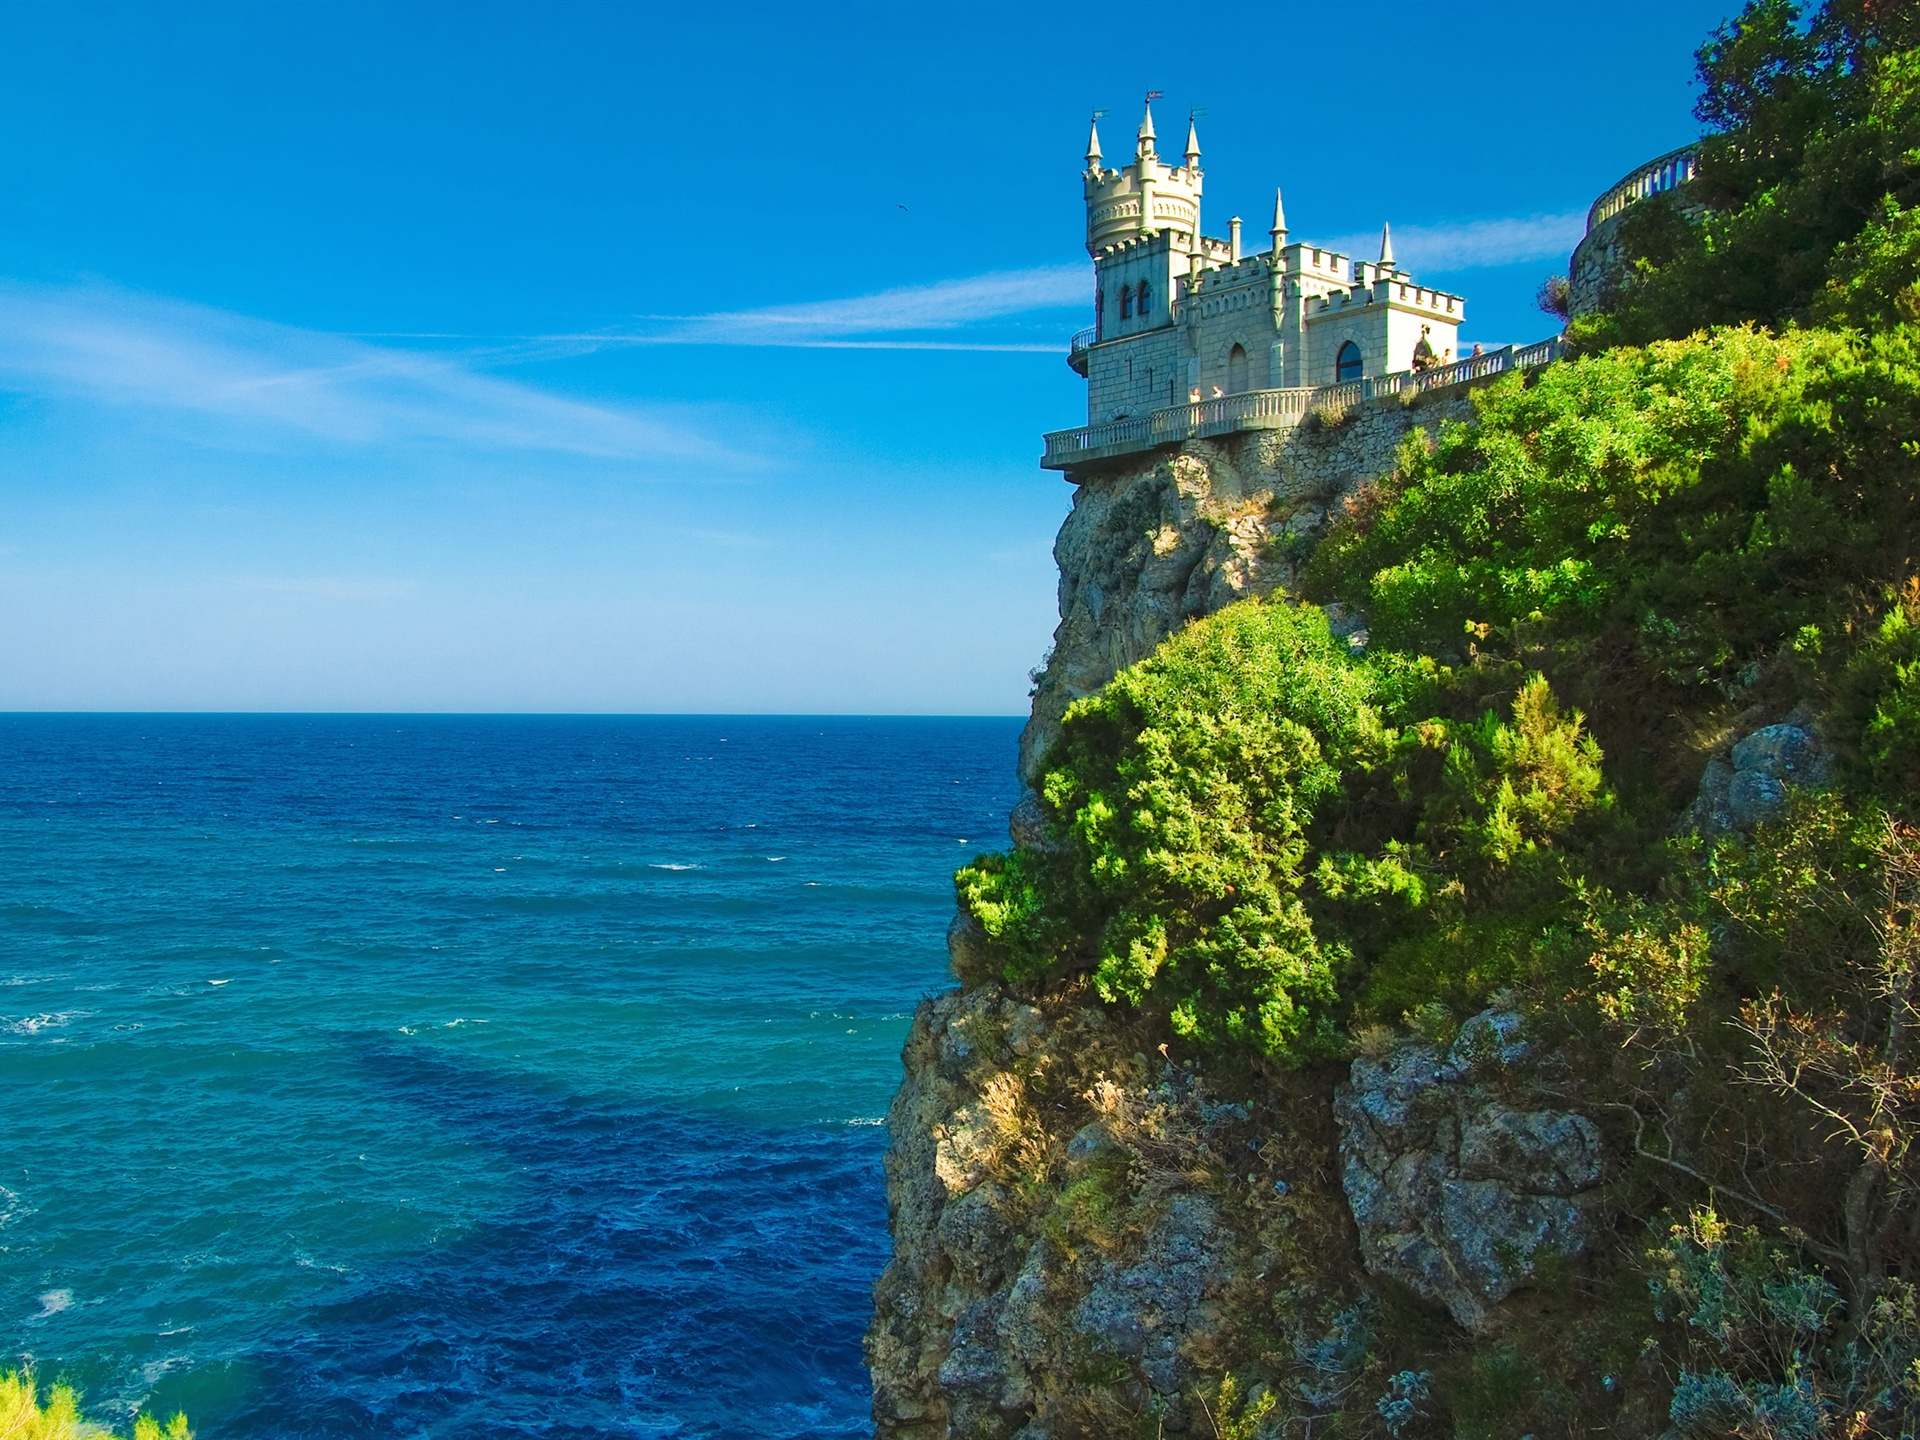 Irish Castle On a Rock